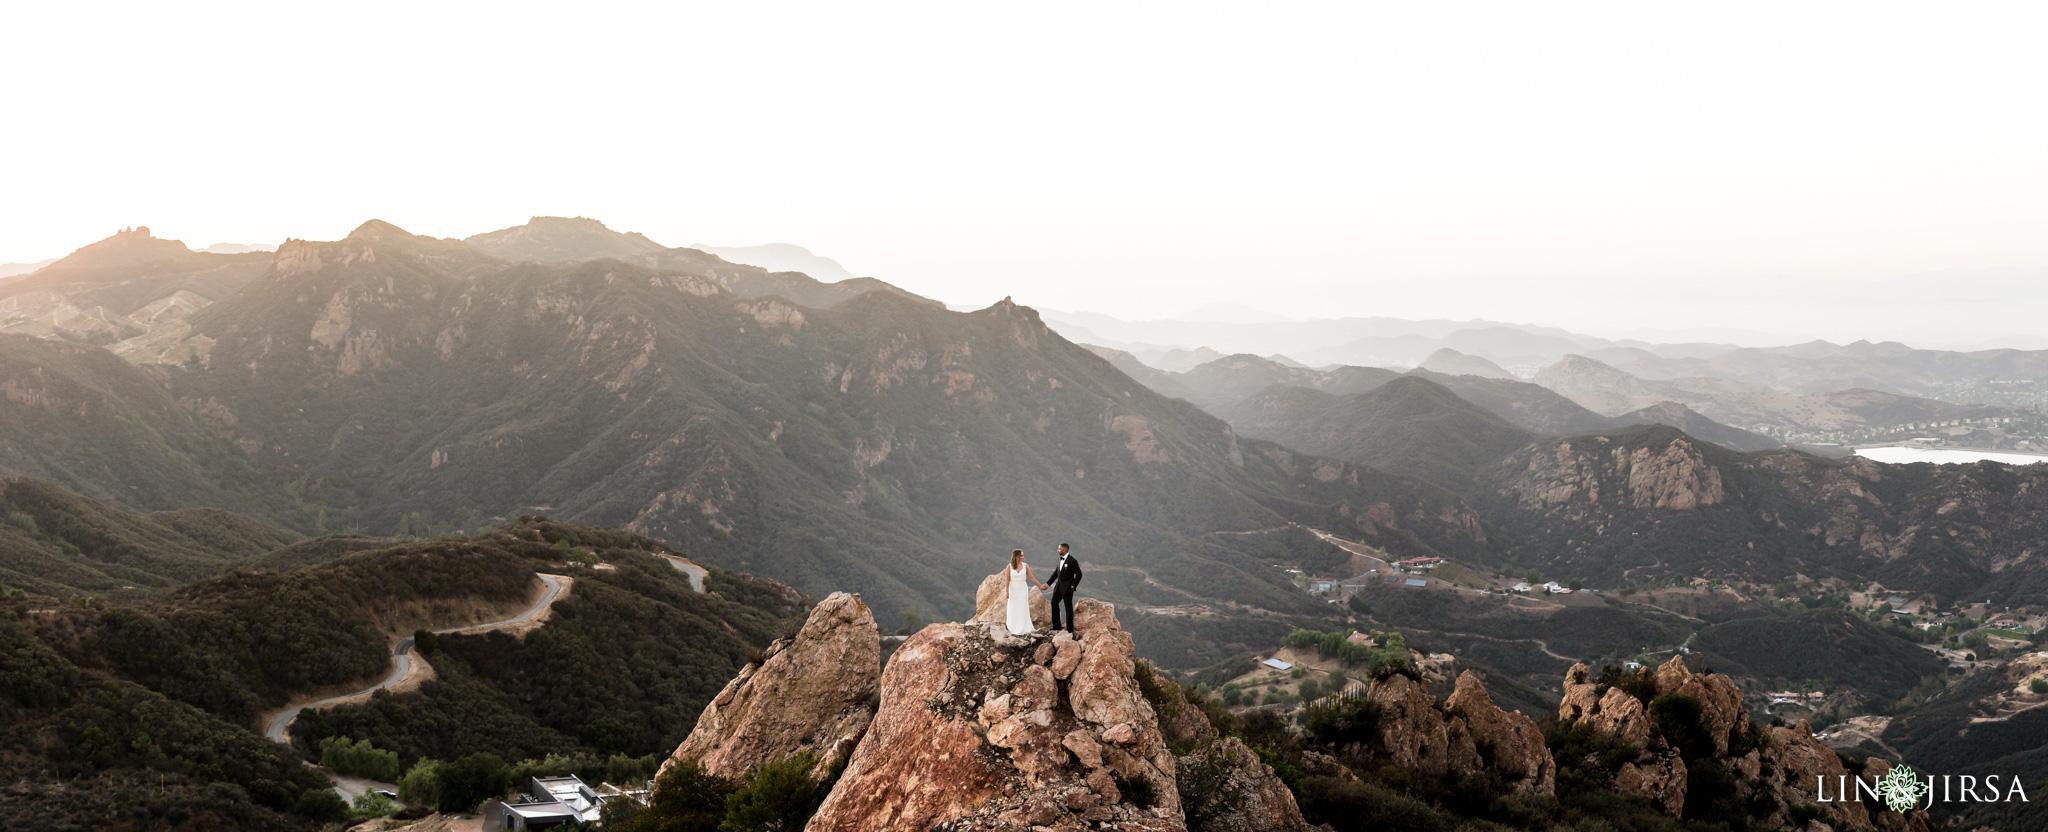 19-malibu-rocky-oaks-estate-wedding-photography